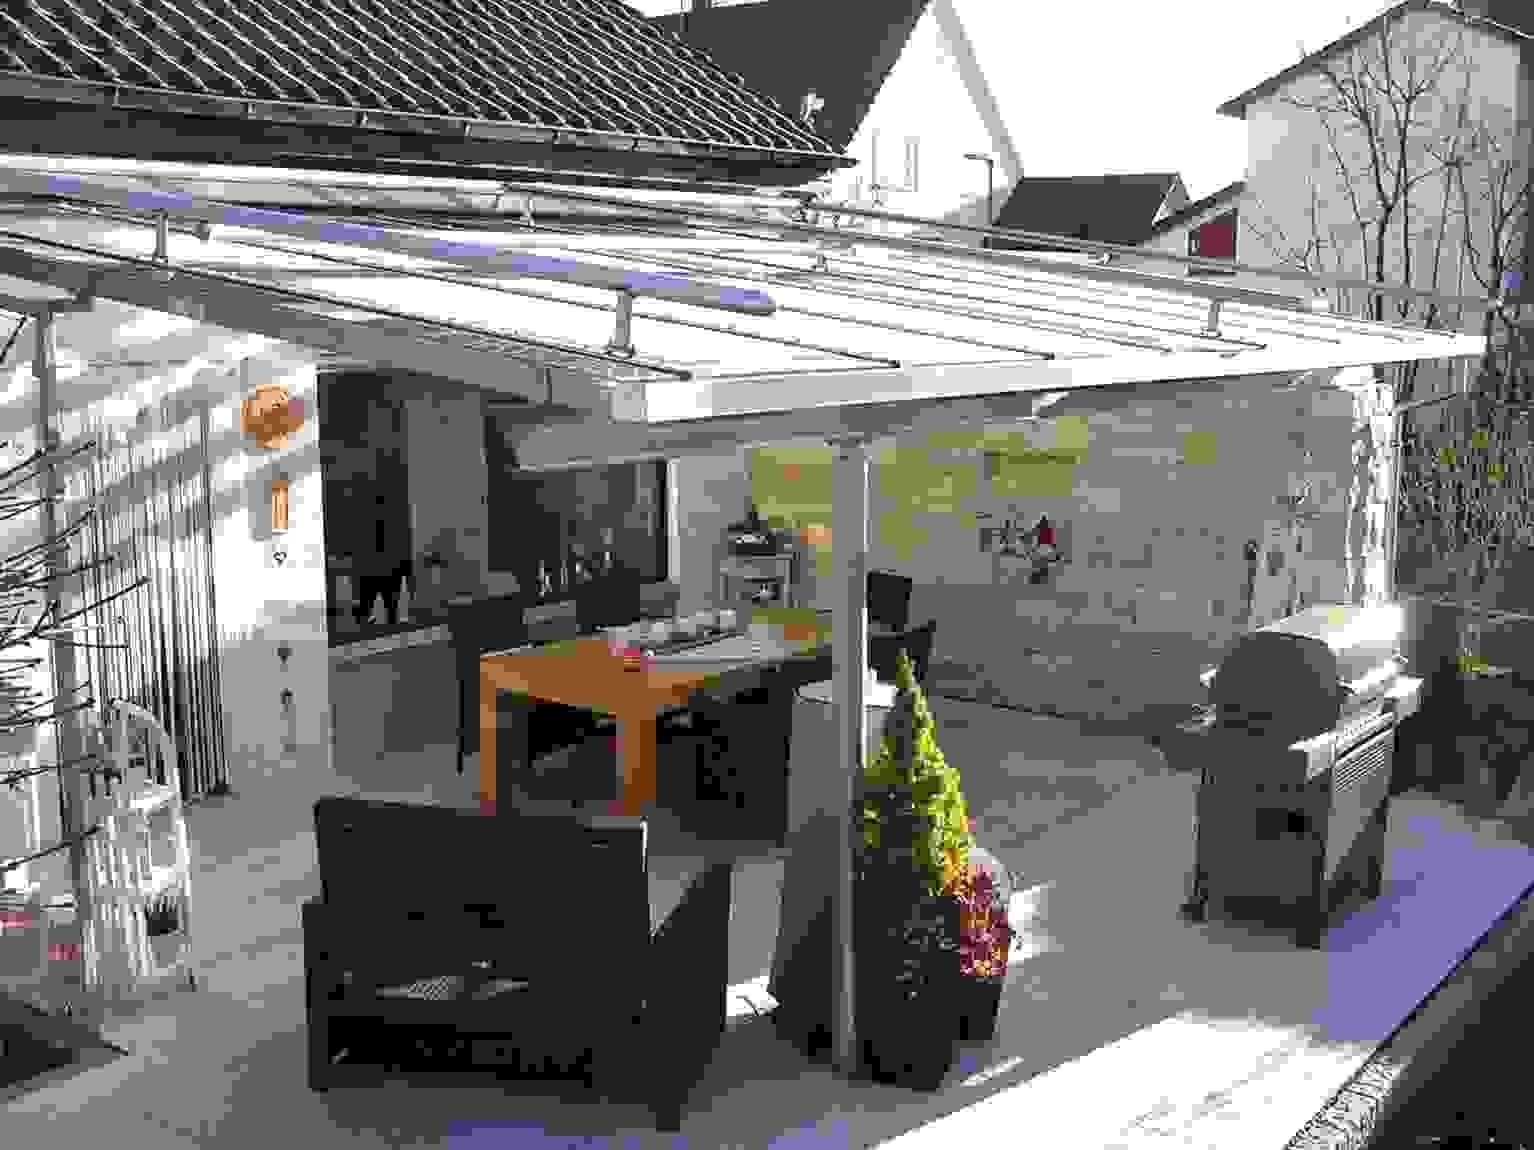 Balkon Regenschutz Selber Bauen Cool Markise Balkon Dekoration von Balkon Regenschutz Selber Bauen Bild